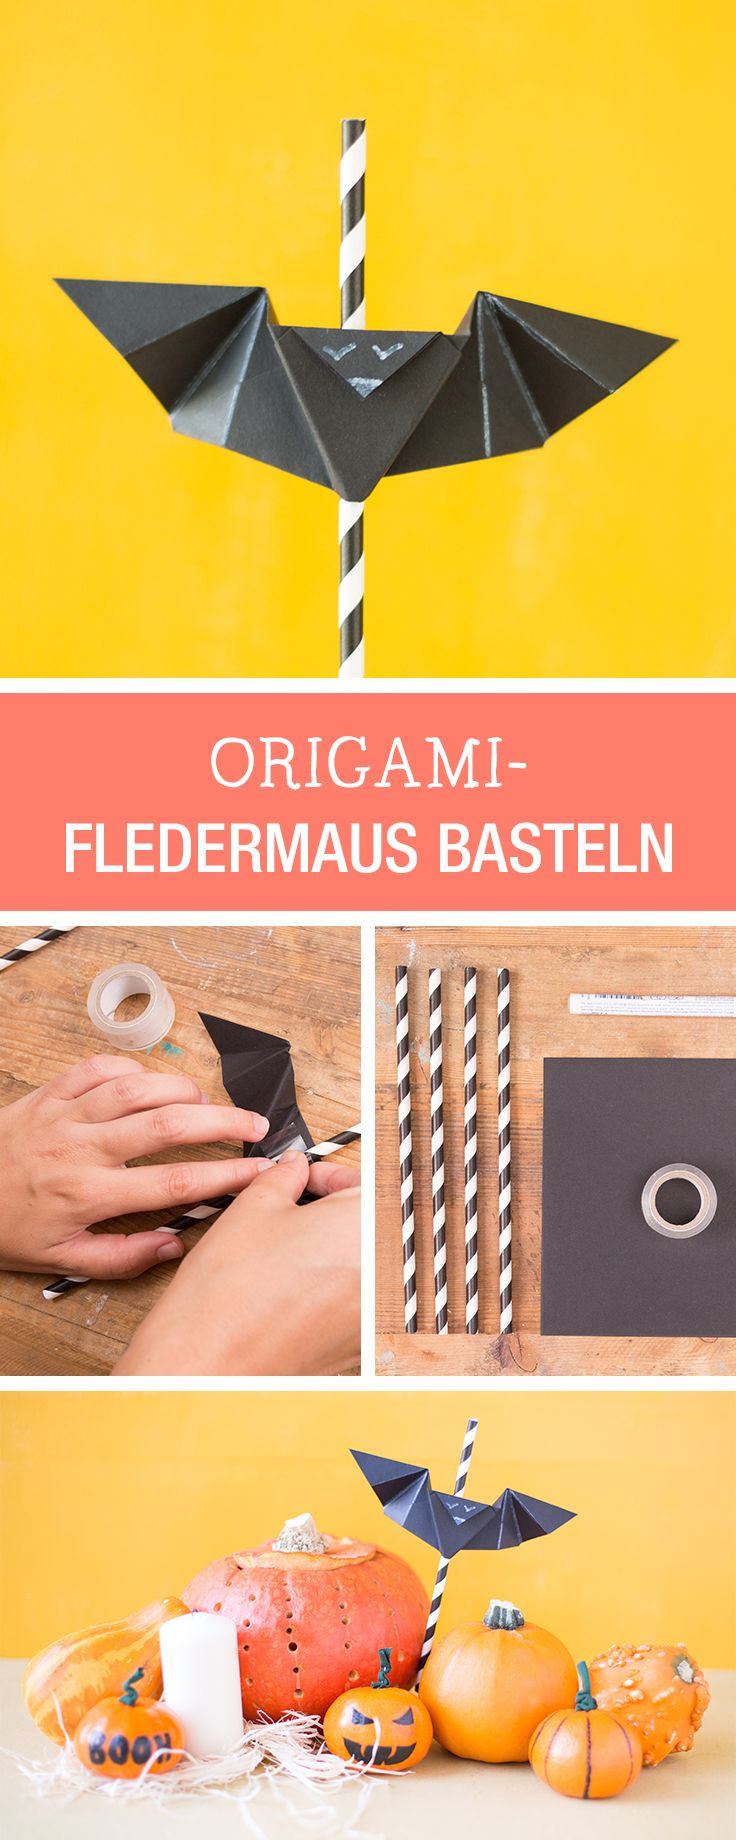 Origami Fledermäuse basteln als Halloween Deko / craft paper bats for halloween via DaWanda.com